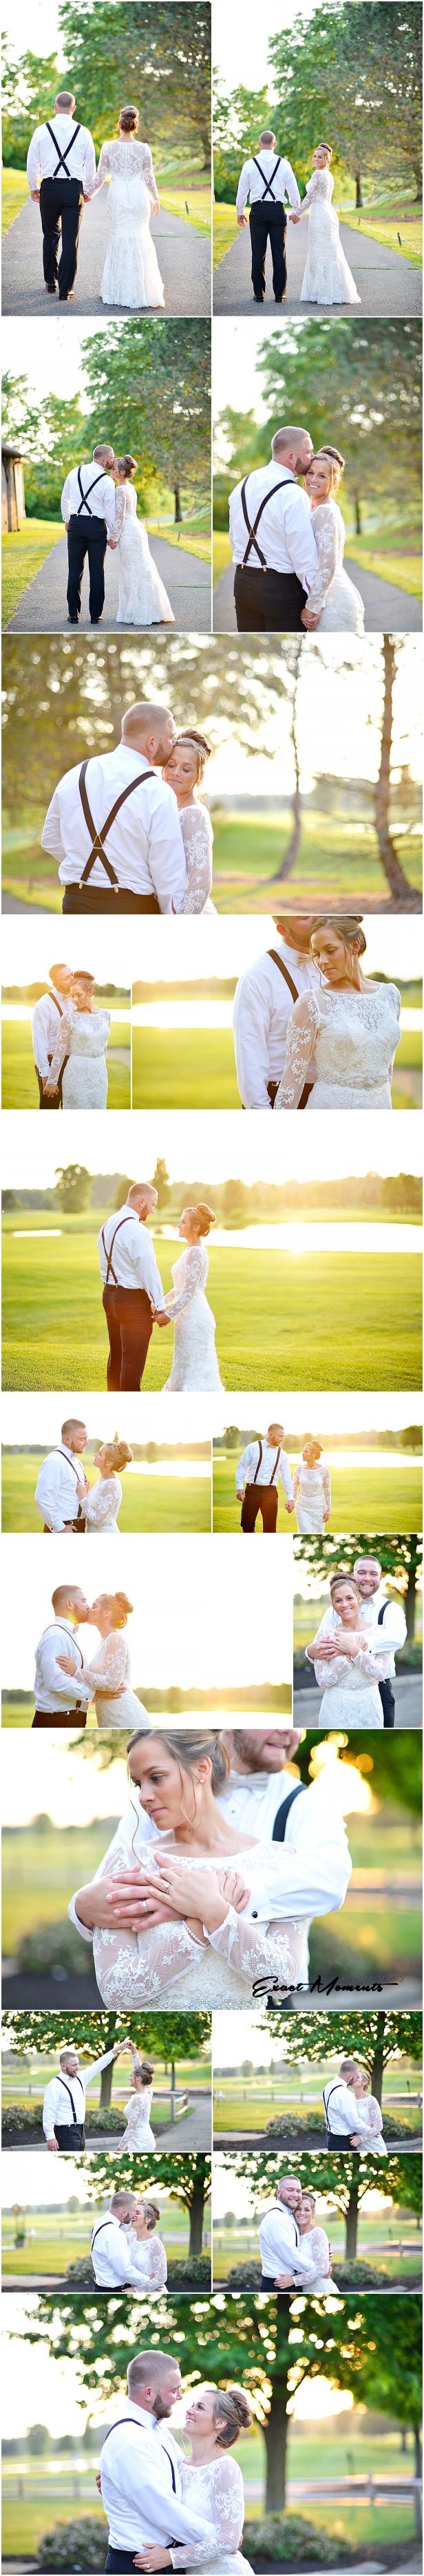 Golf Club Weddings Columbus Ohio